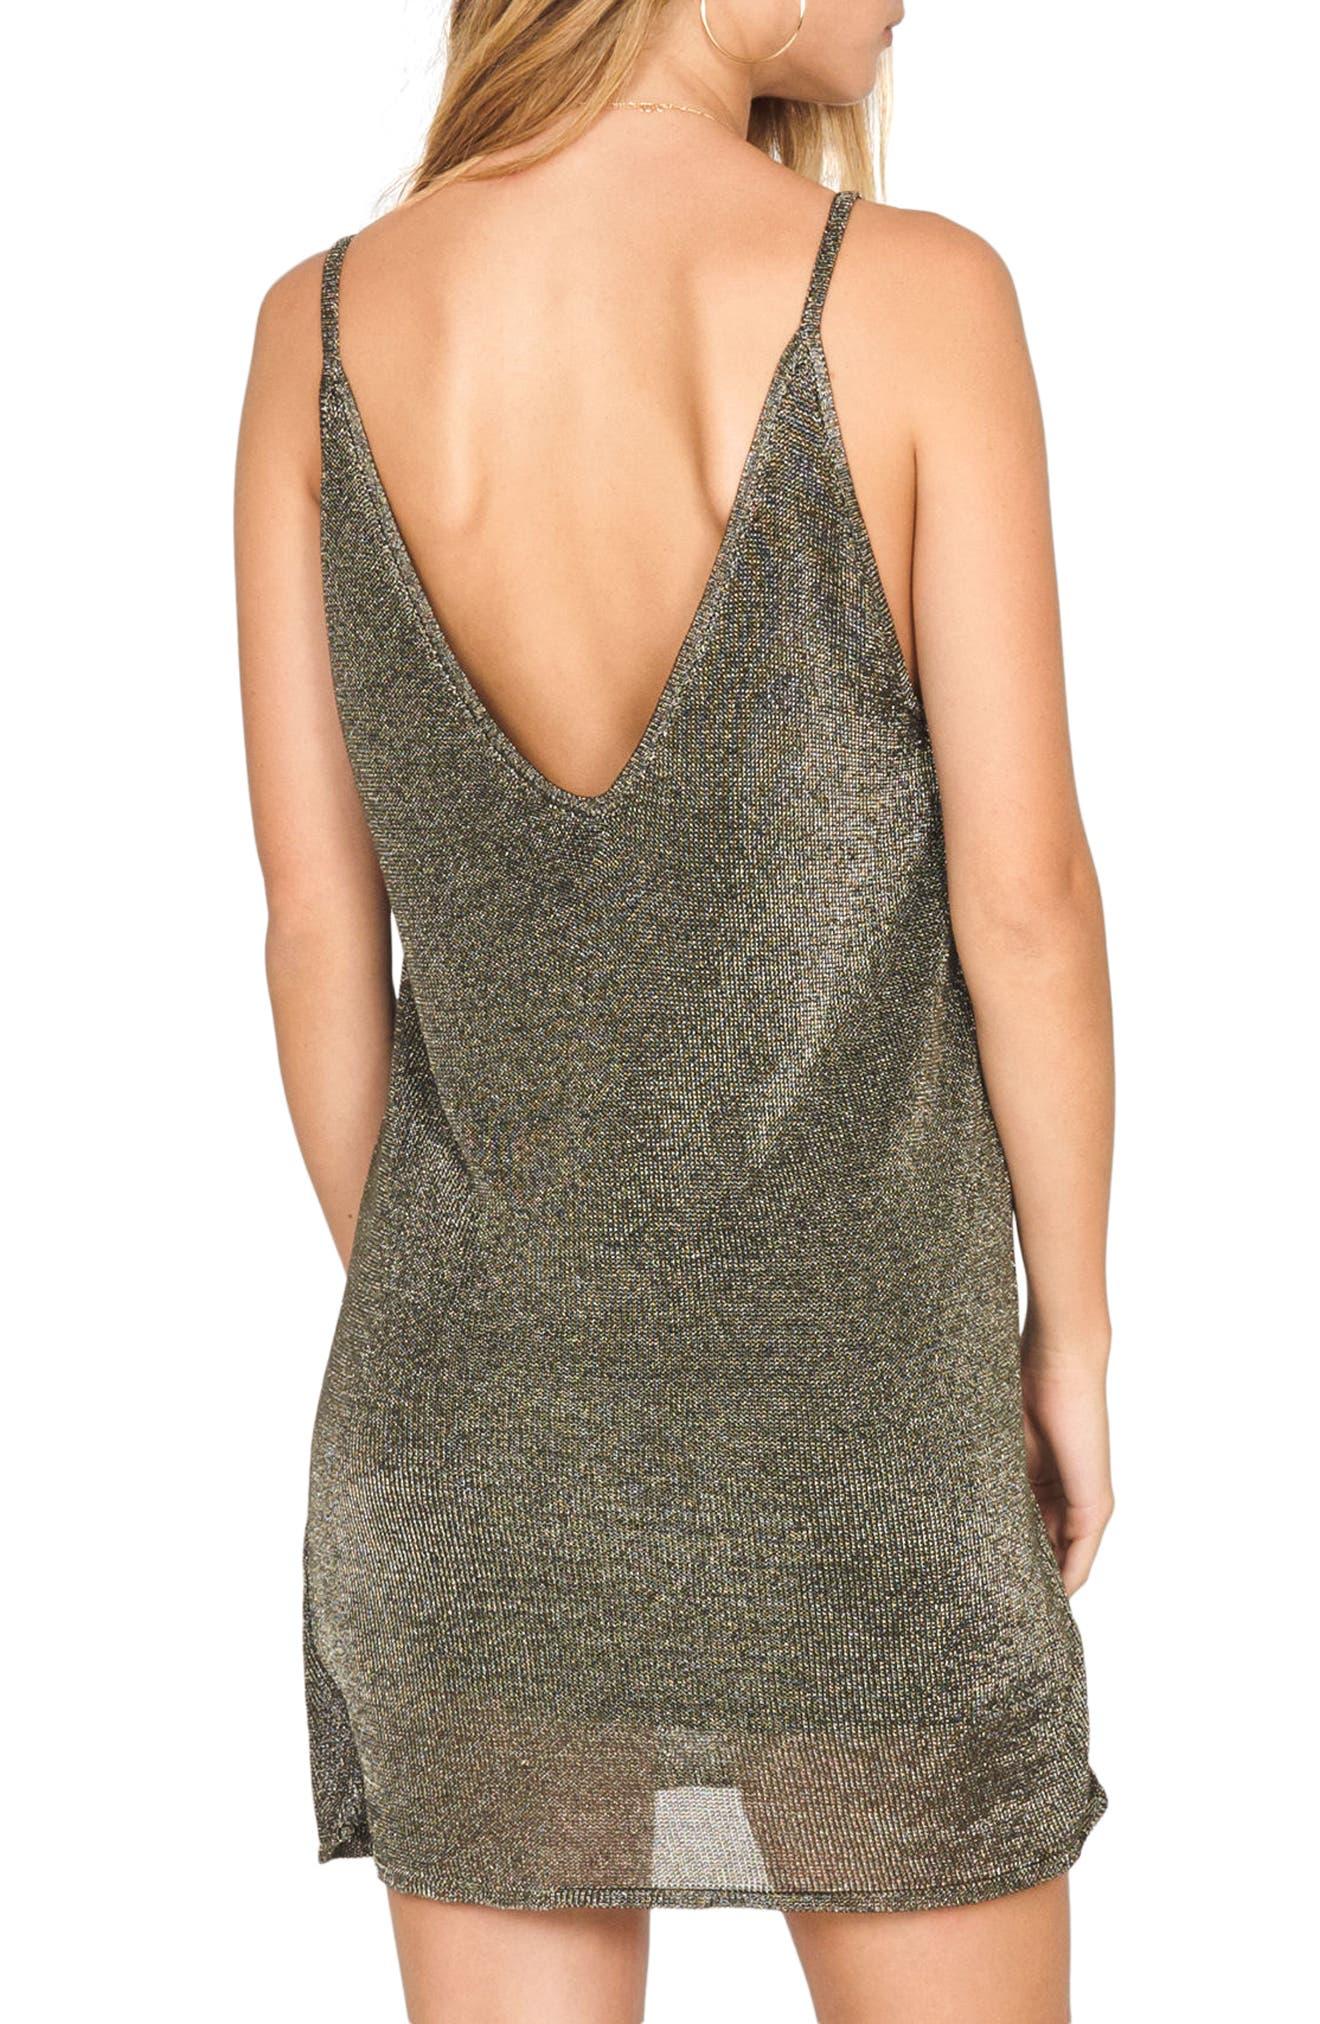 Ray of Light Metallic Knit Dress,                             Alternate thumbnail 3, color,                             Bronze